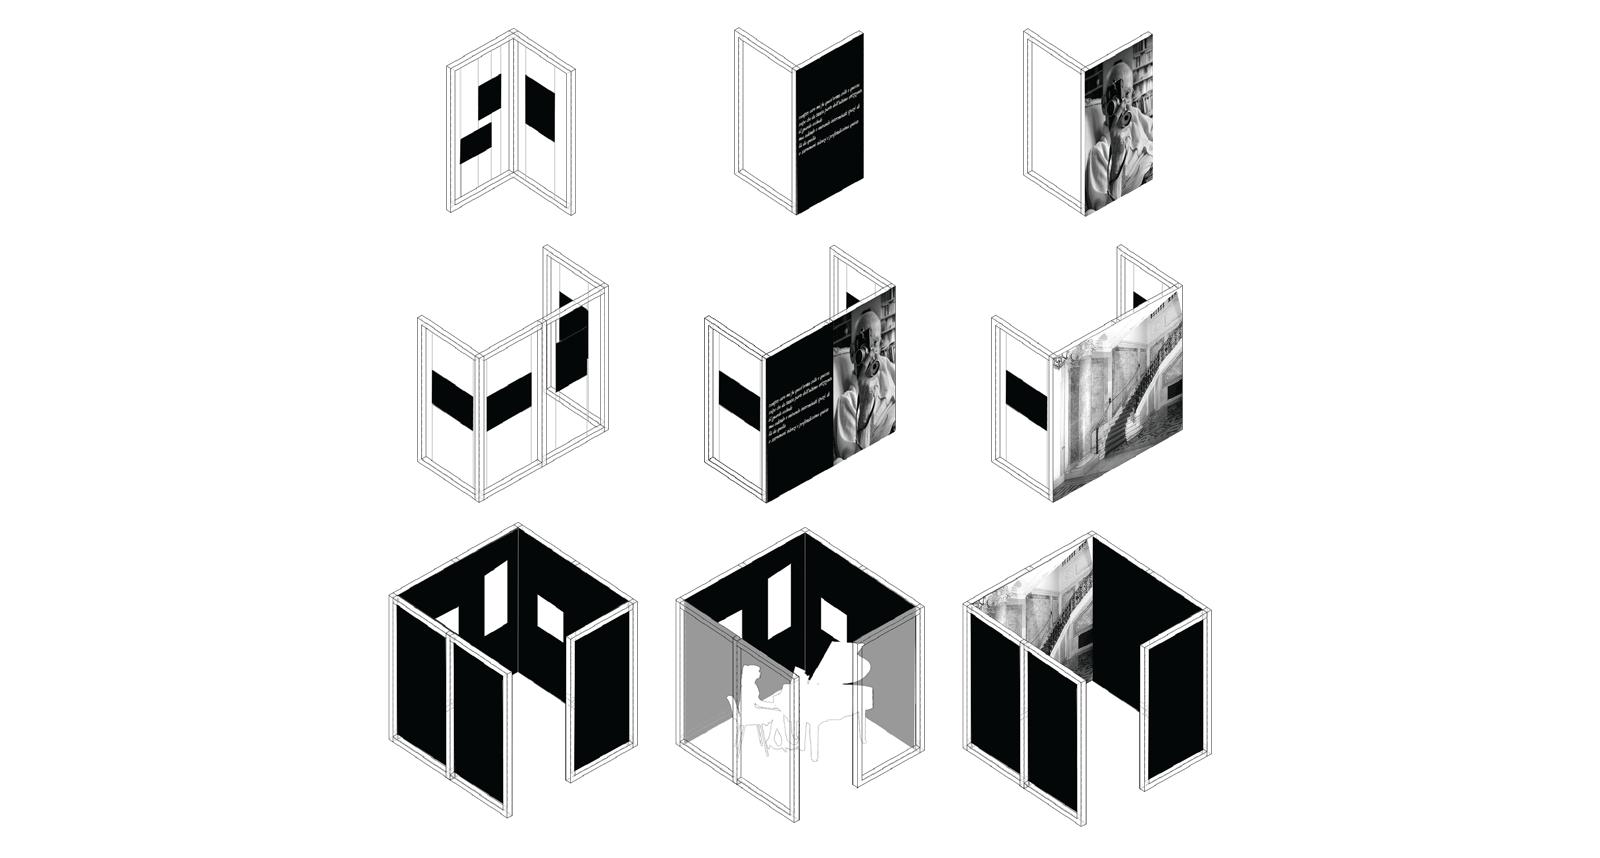 allestimento-fotografico-ferrara-modules